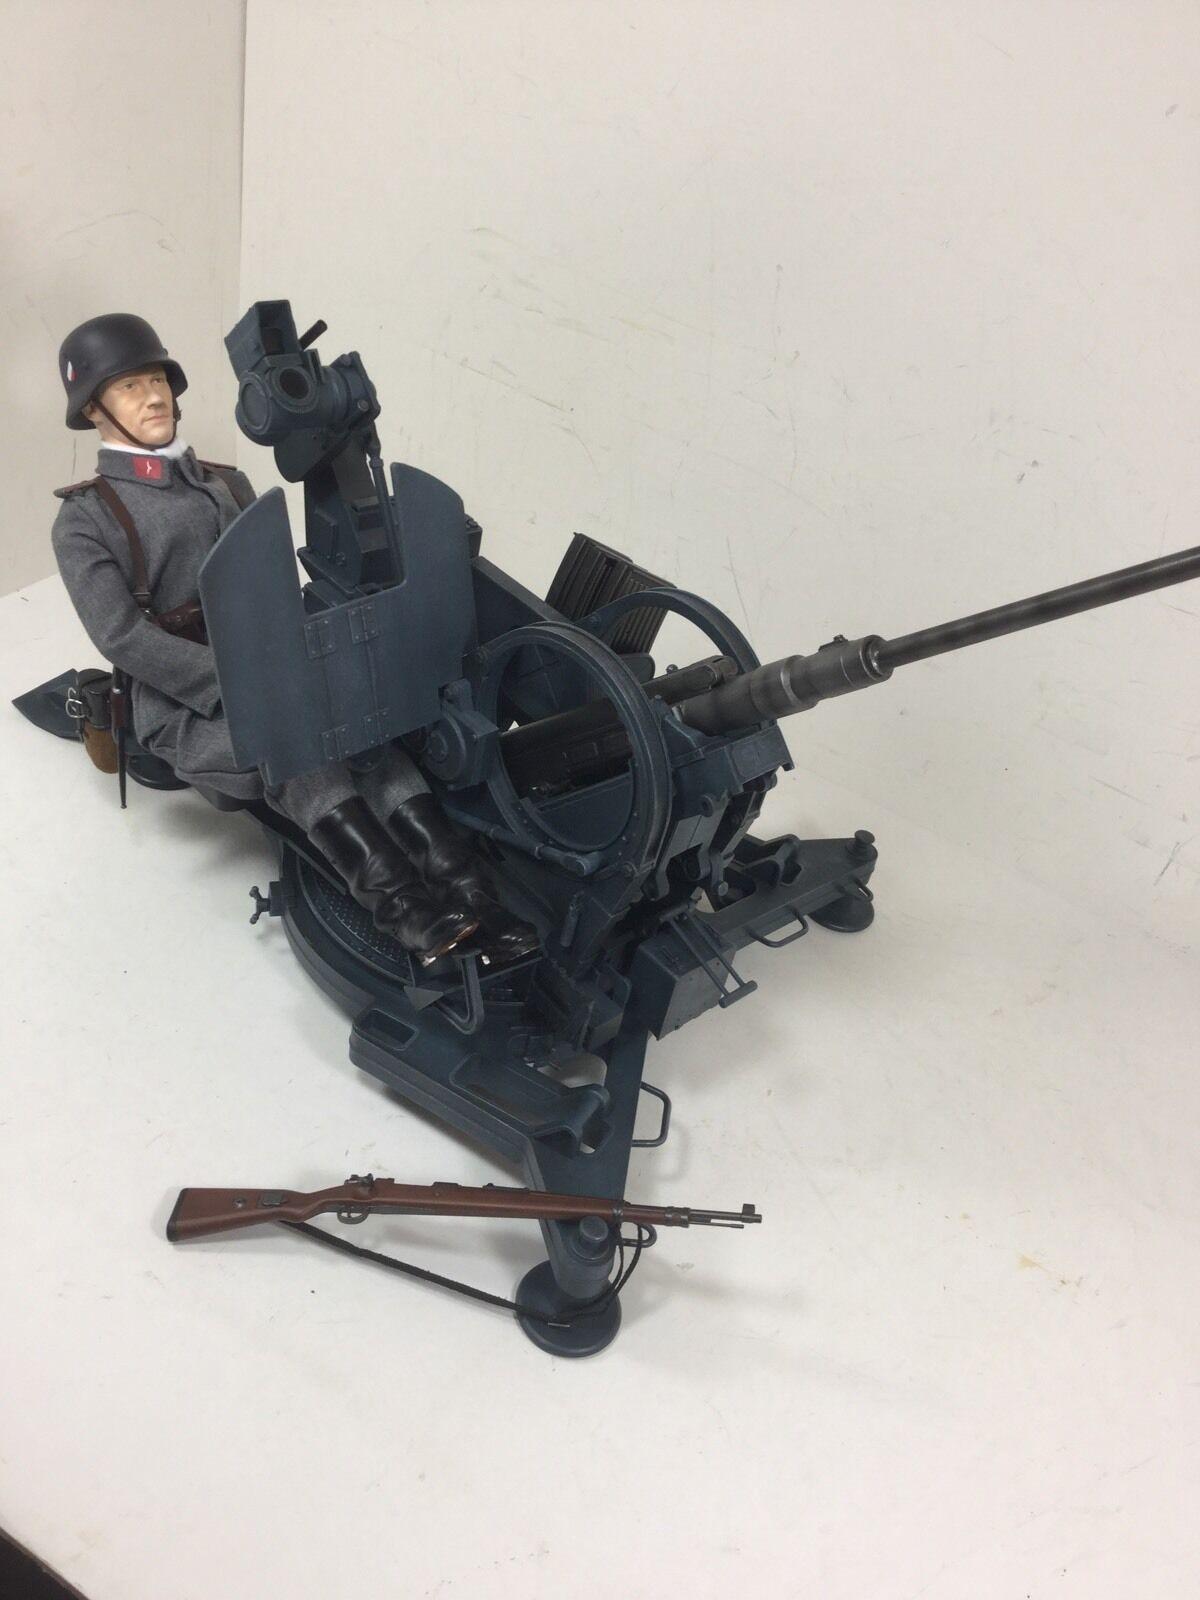 1 6 DRAGON GERMAN LUFTWAFFE 2cm FLAK 38 ANTI AIRCRAFT GUN+GUNNER BBI 21 DID WW2